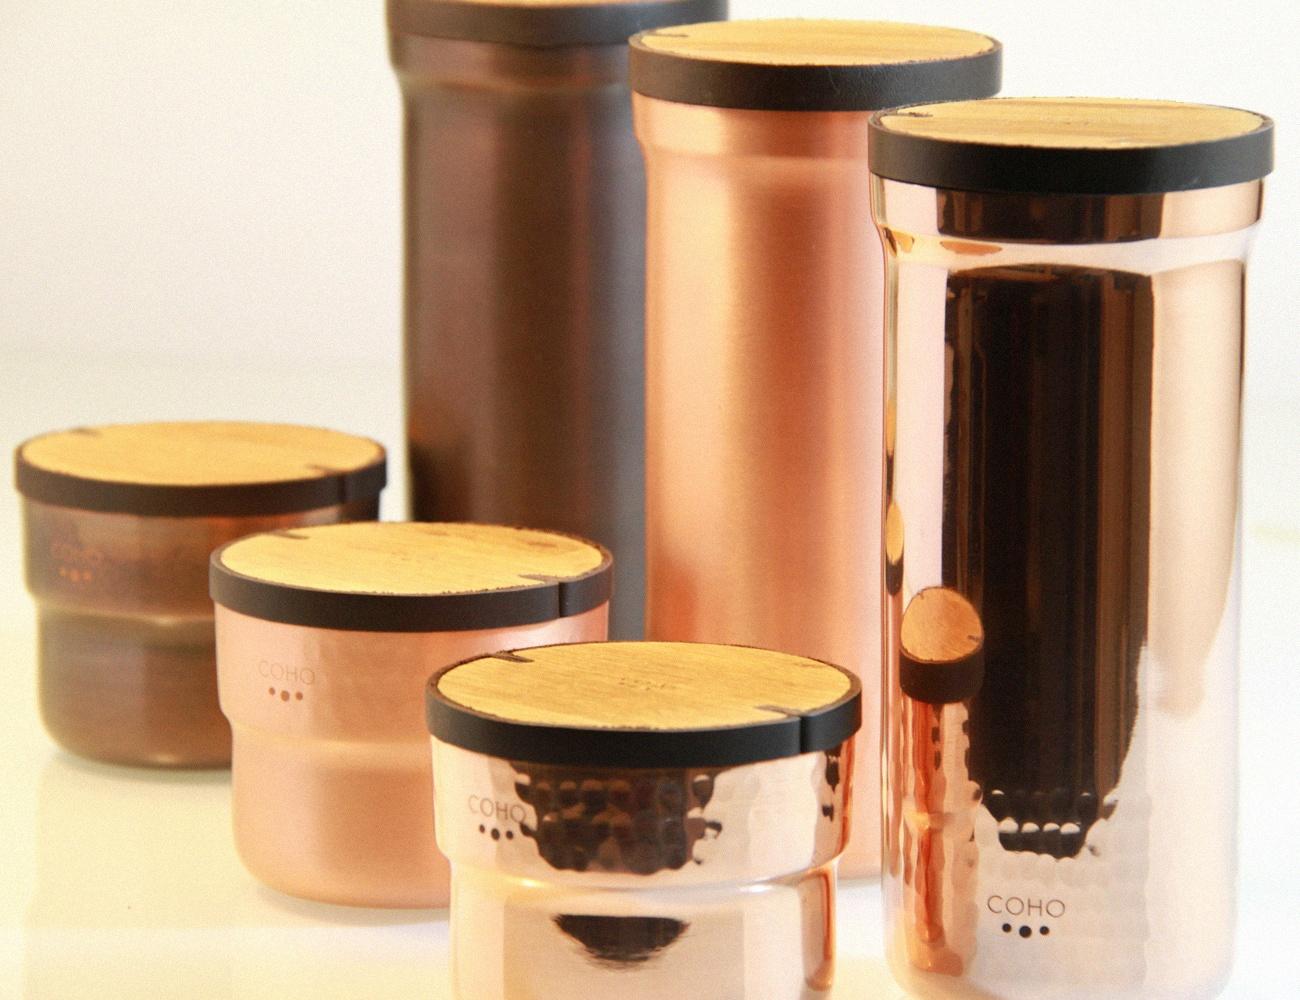 COHO Handmade Copper Water Enricher Set